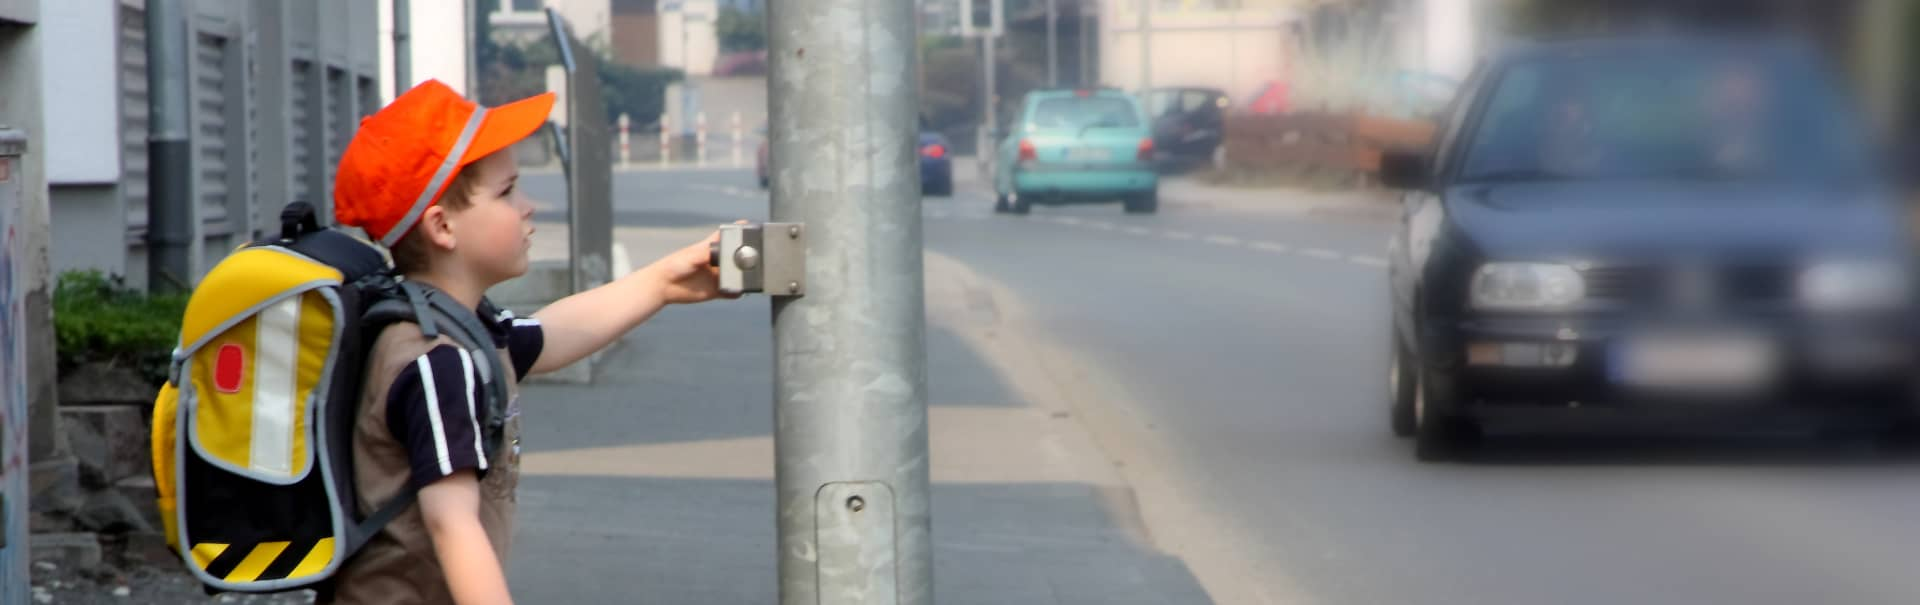 Unfall am Bordstein: Haftung liegt bei Autofahrer*innen